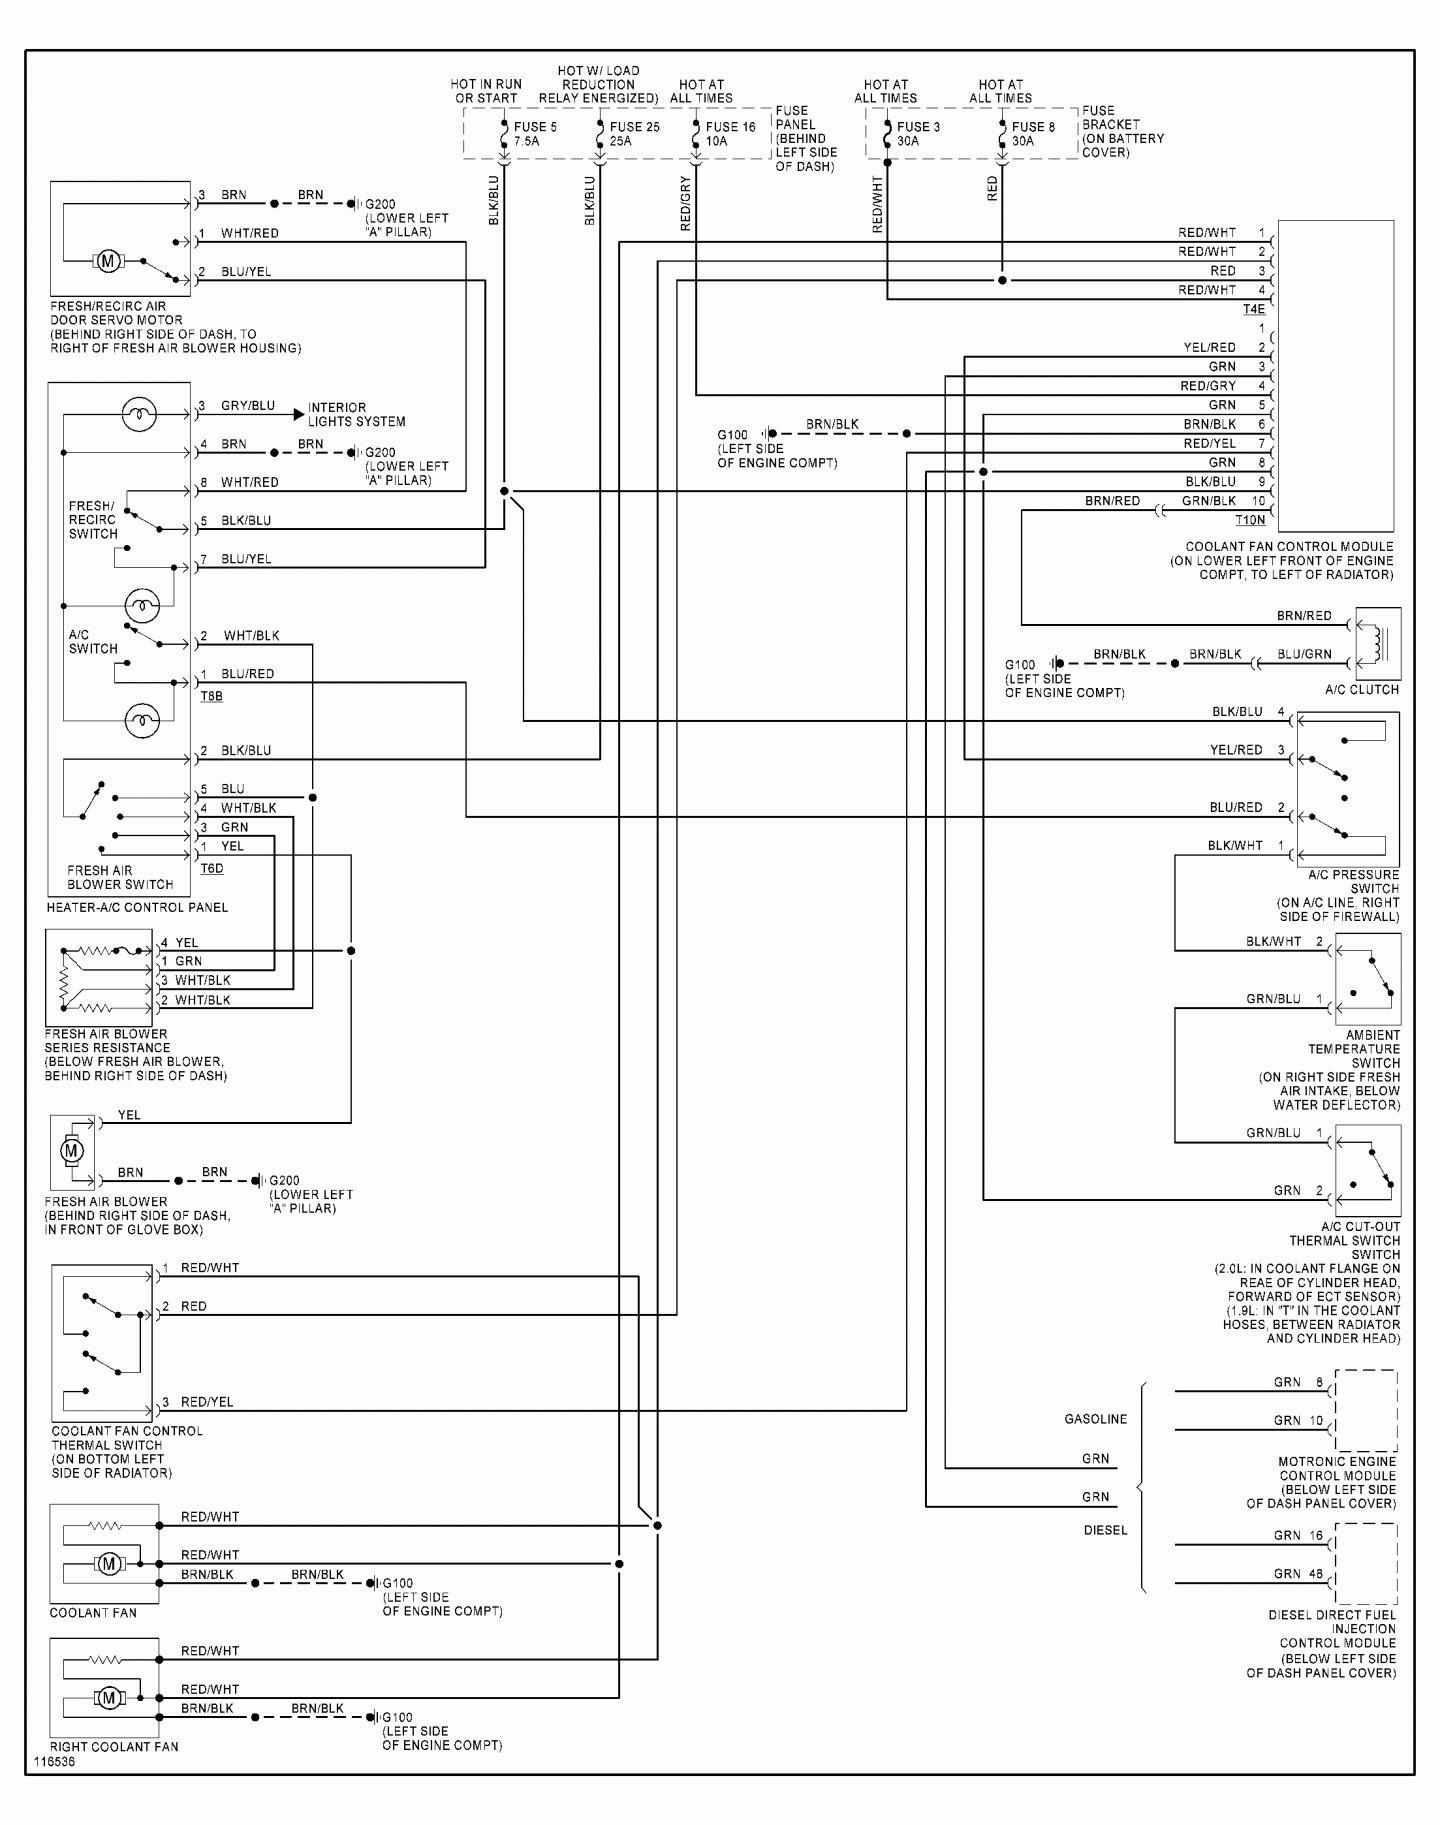 DIAGRAM] Vw Beetle Monsoon Radio Wiring Diagram FULL Version HD Quality  Wiring Diagram - CORRECTWIRING.ETTOREBASSI.ITEttore Bassi